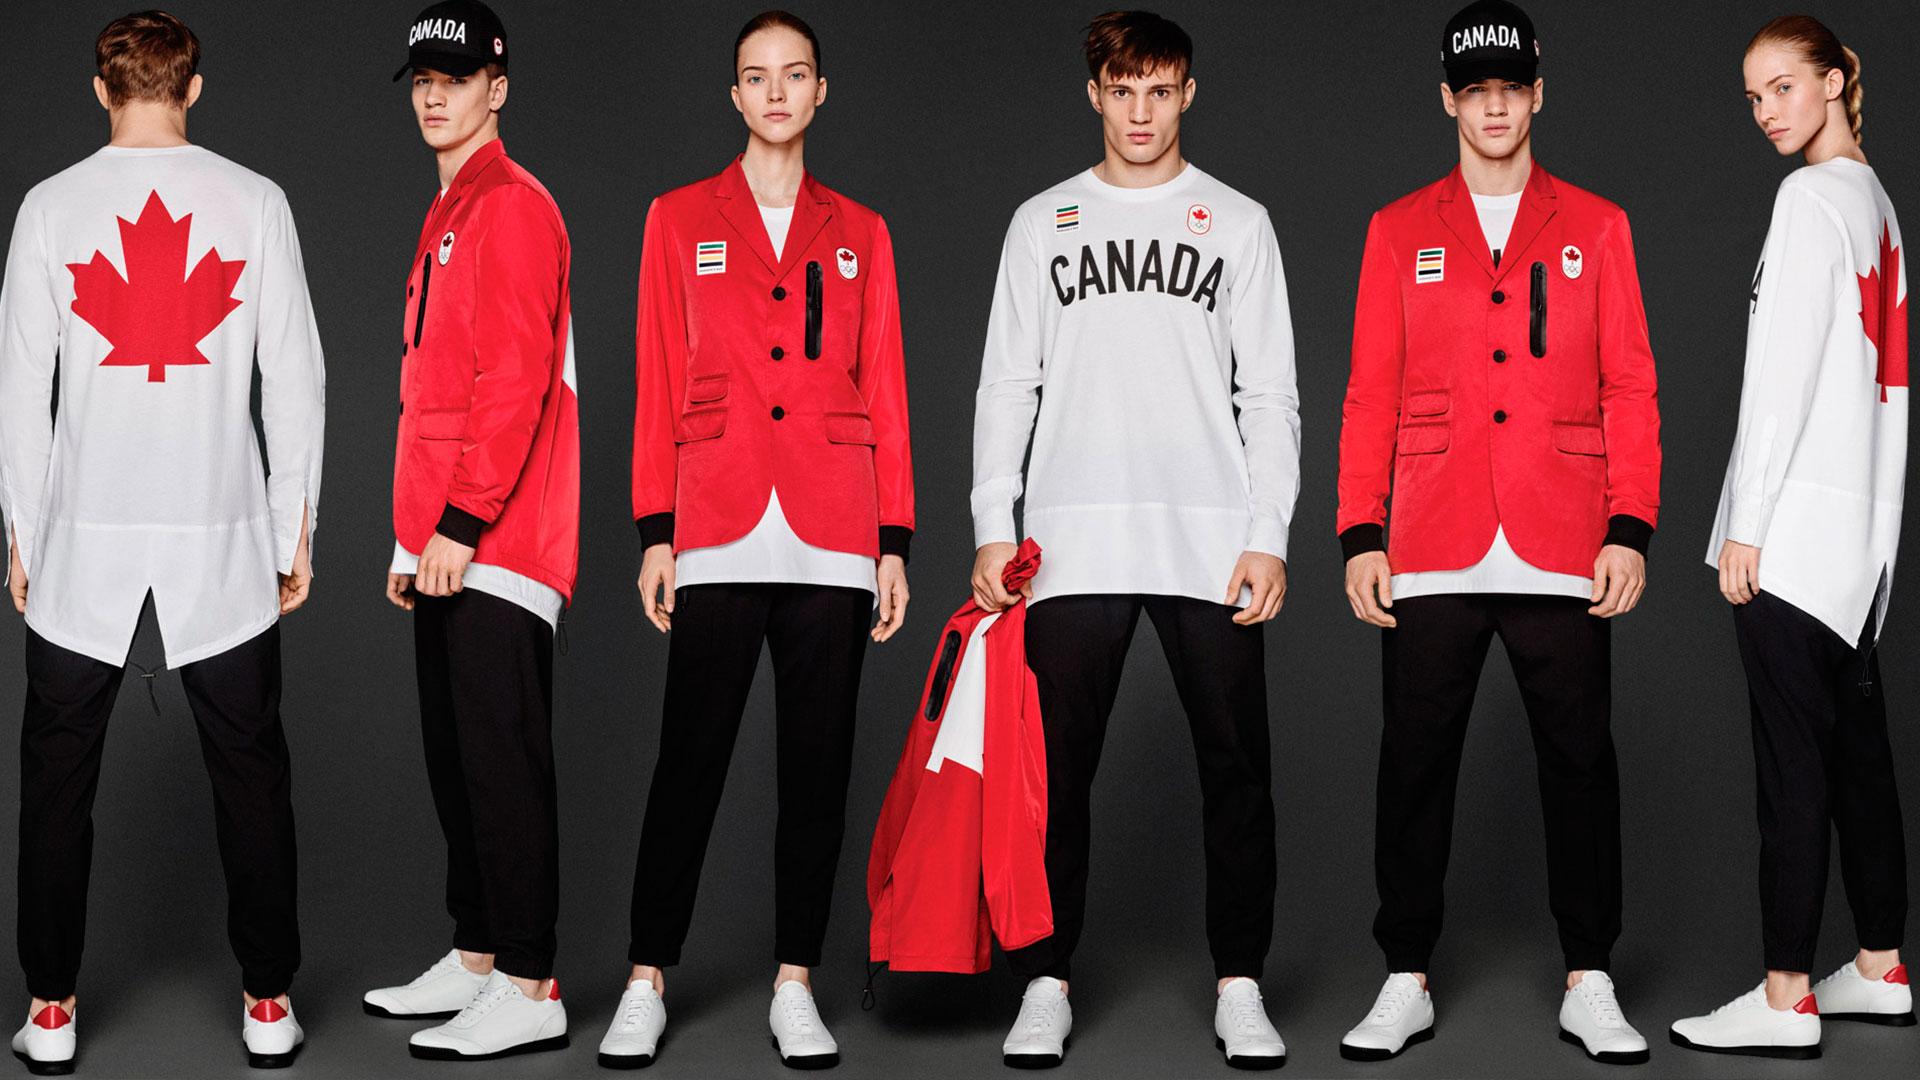 Moda Olimpiadas hero asset